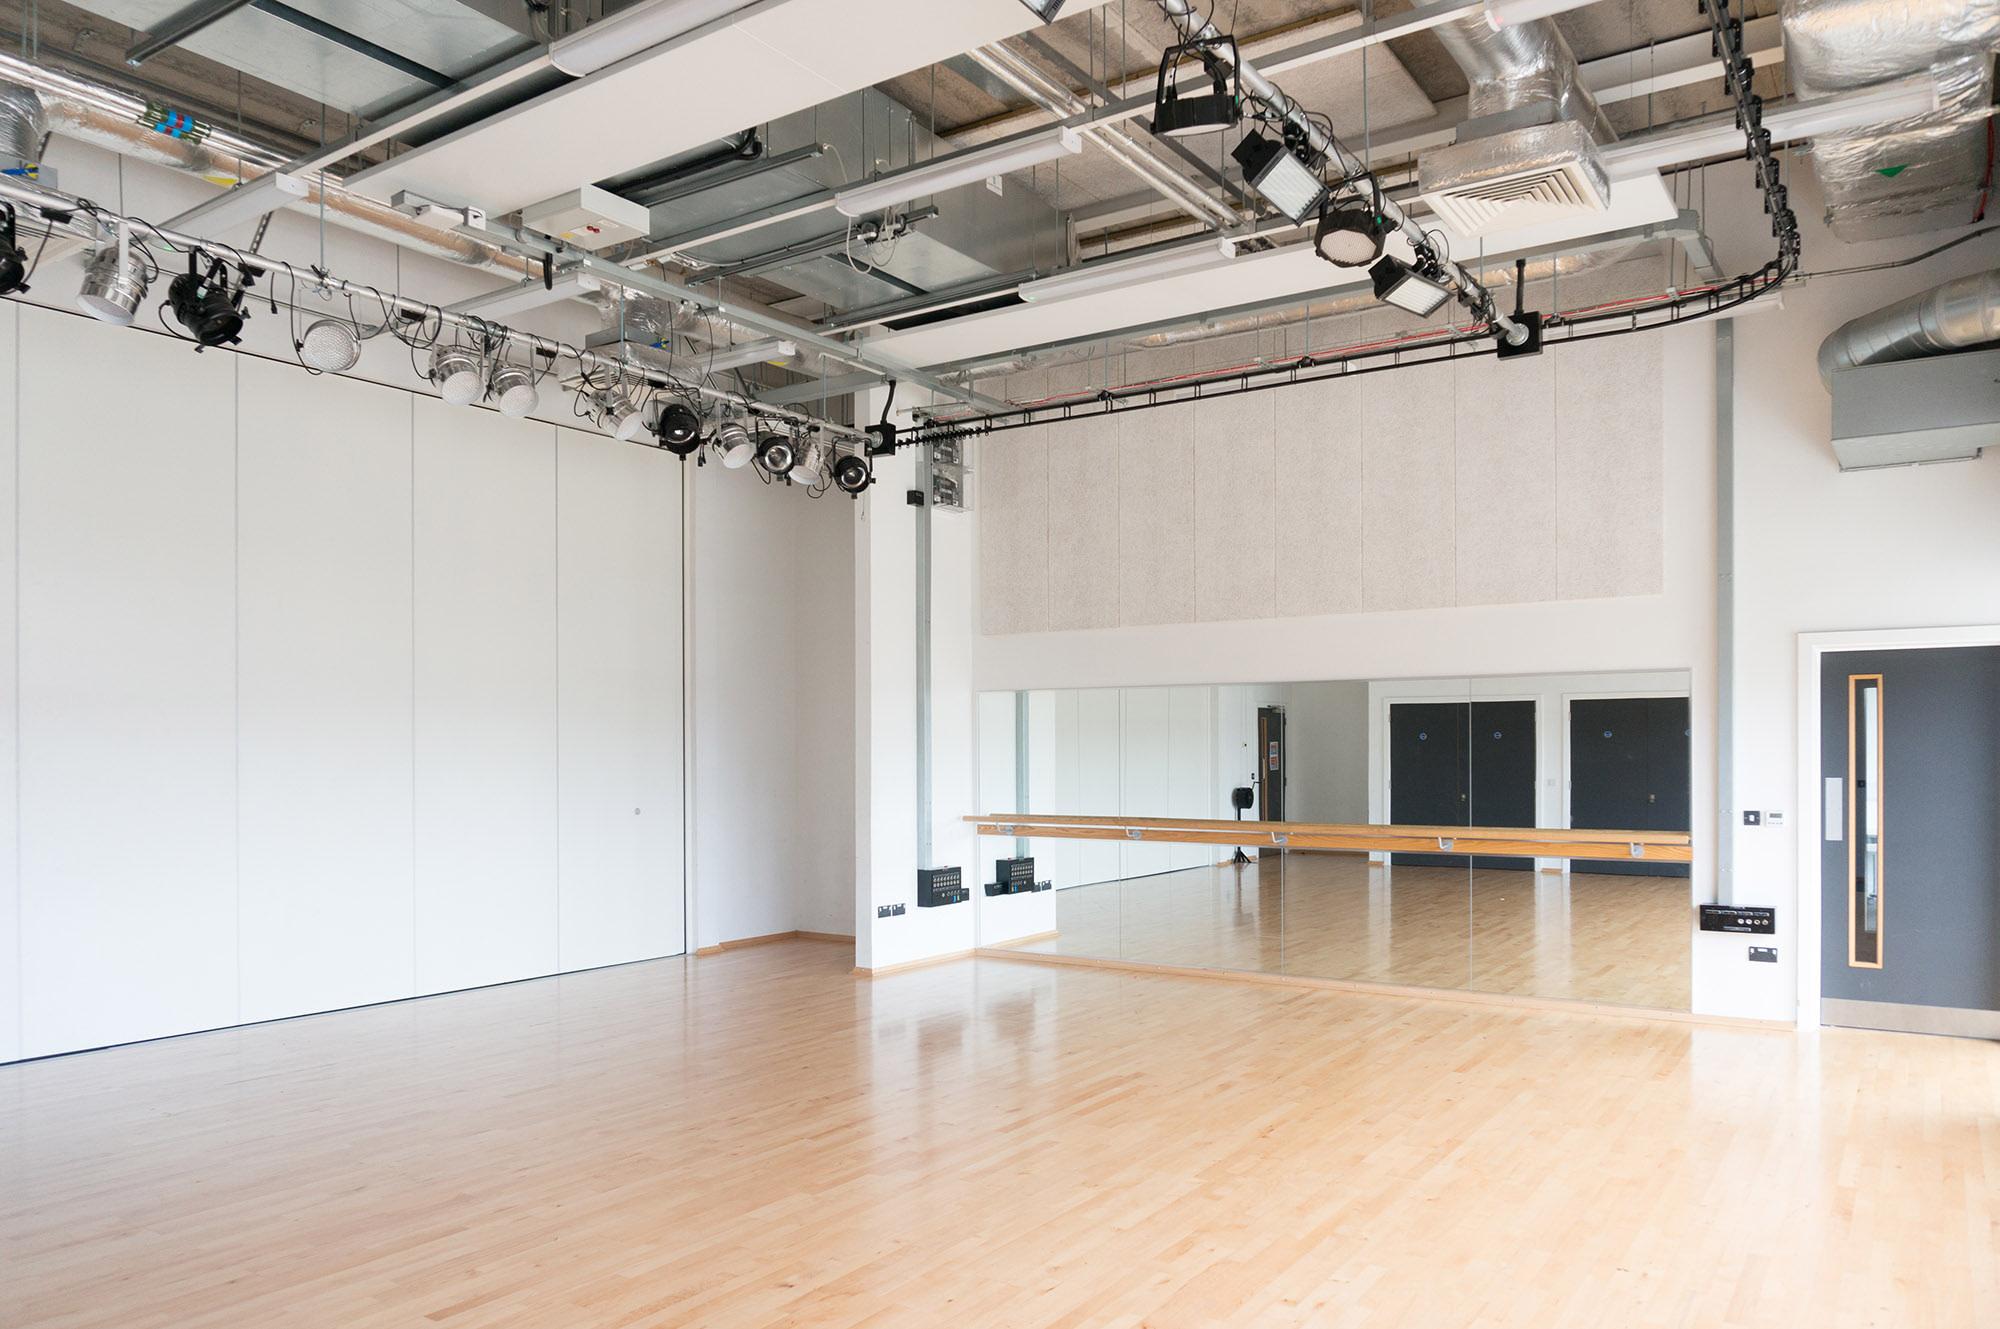 View of the dance studio